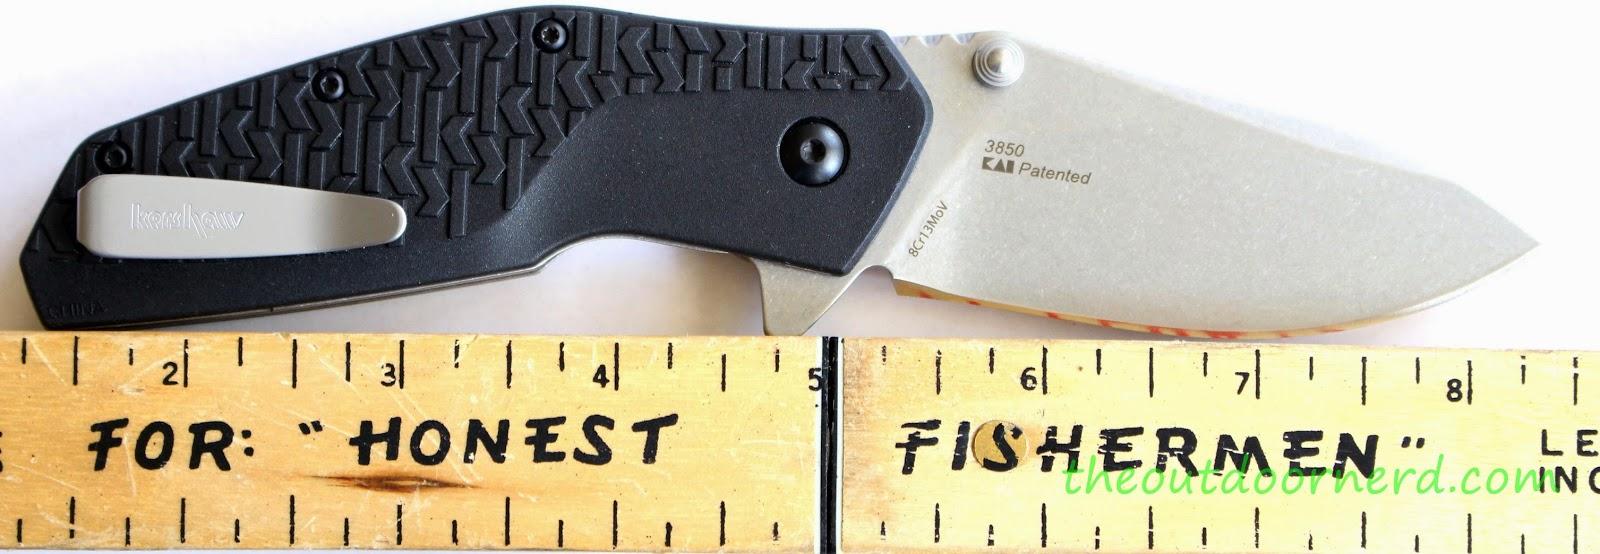 Kershaw Swerve EDC Pocket Knife: Next To Ruler